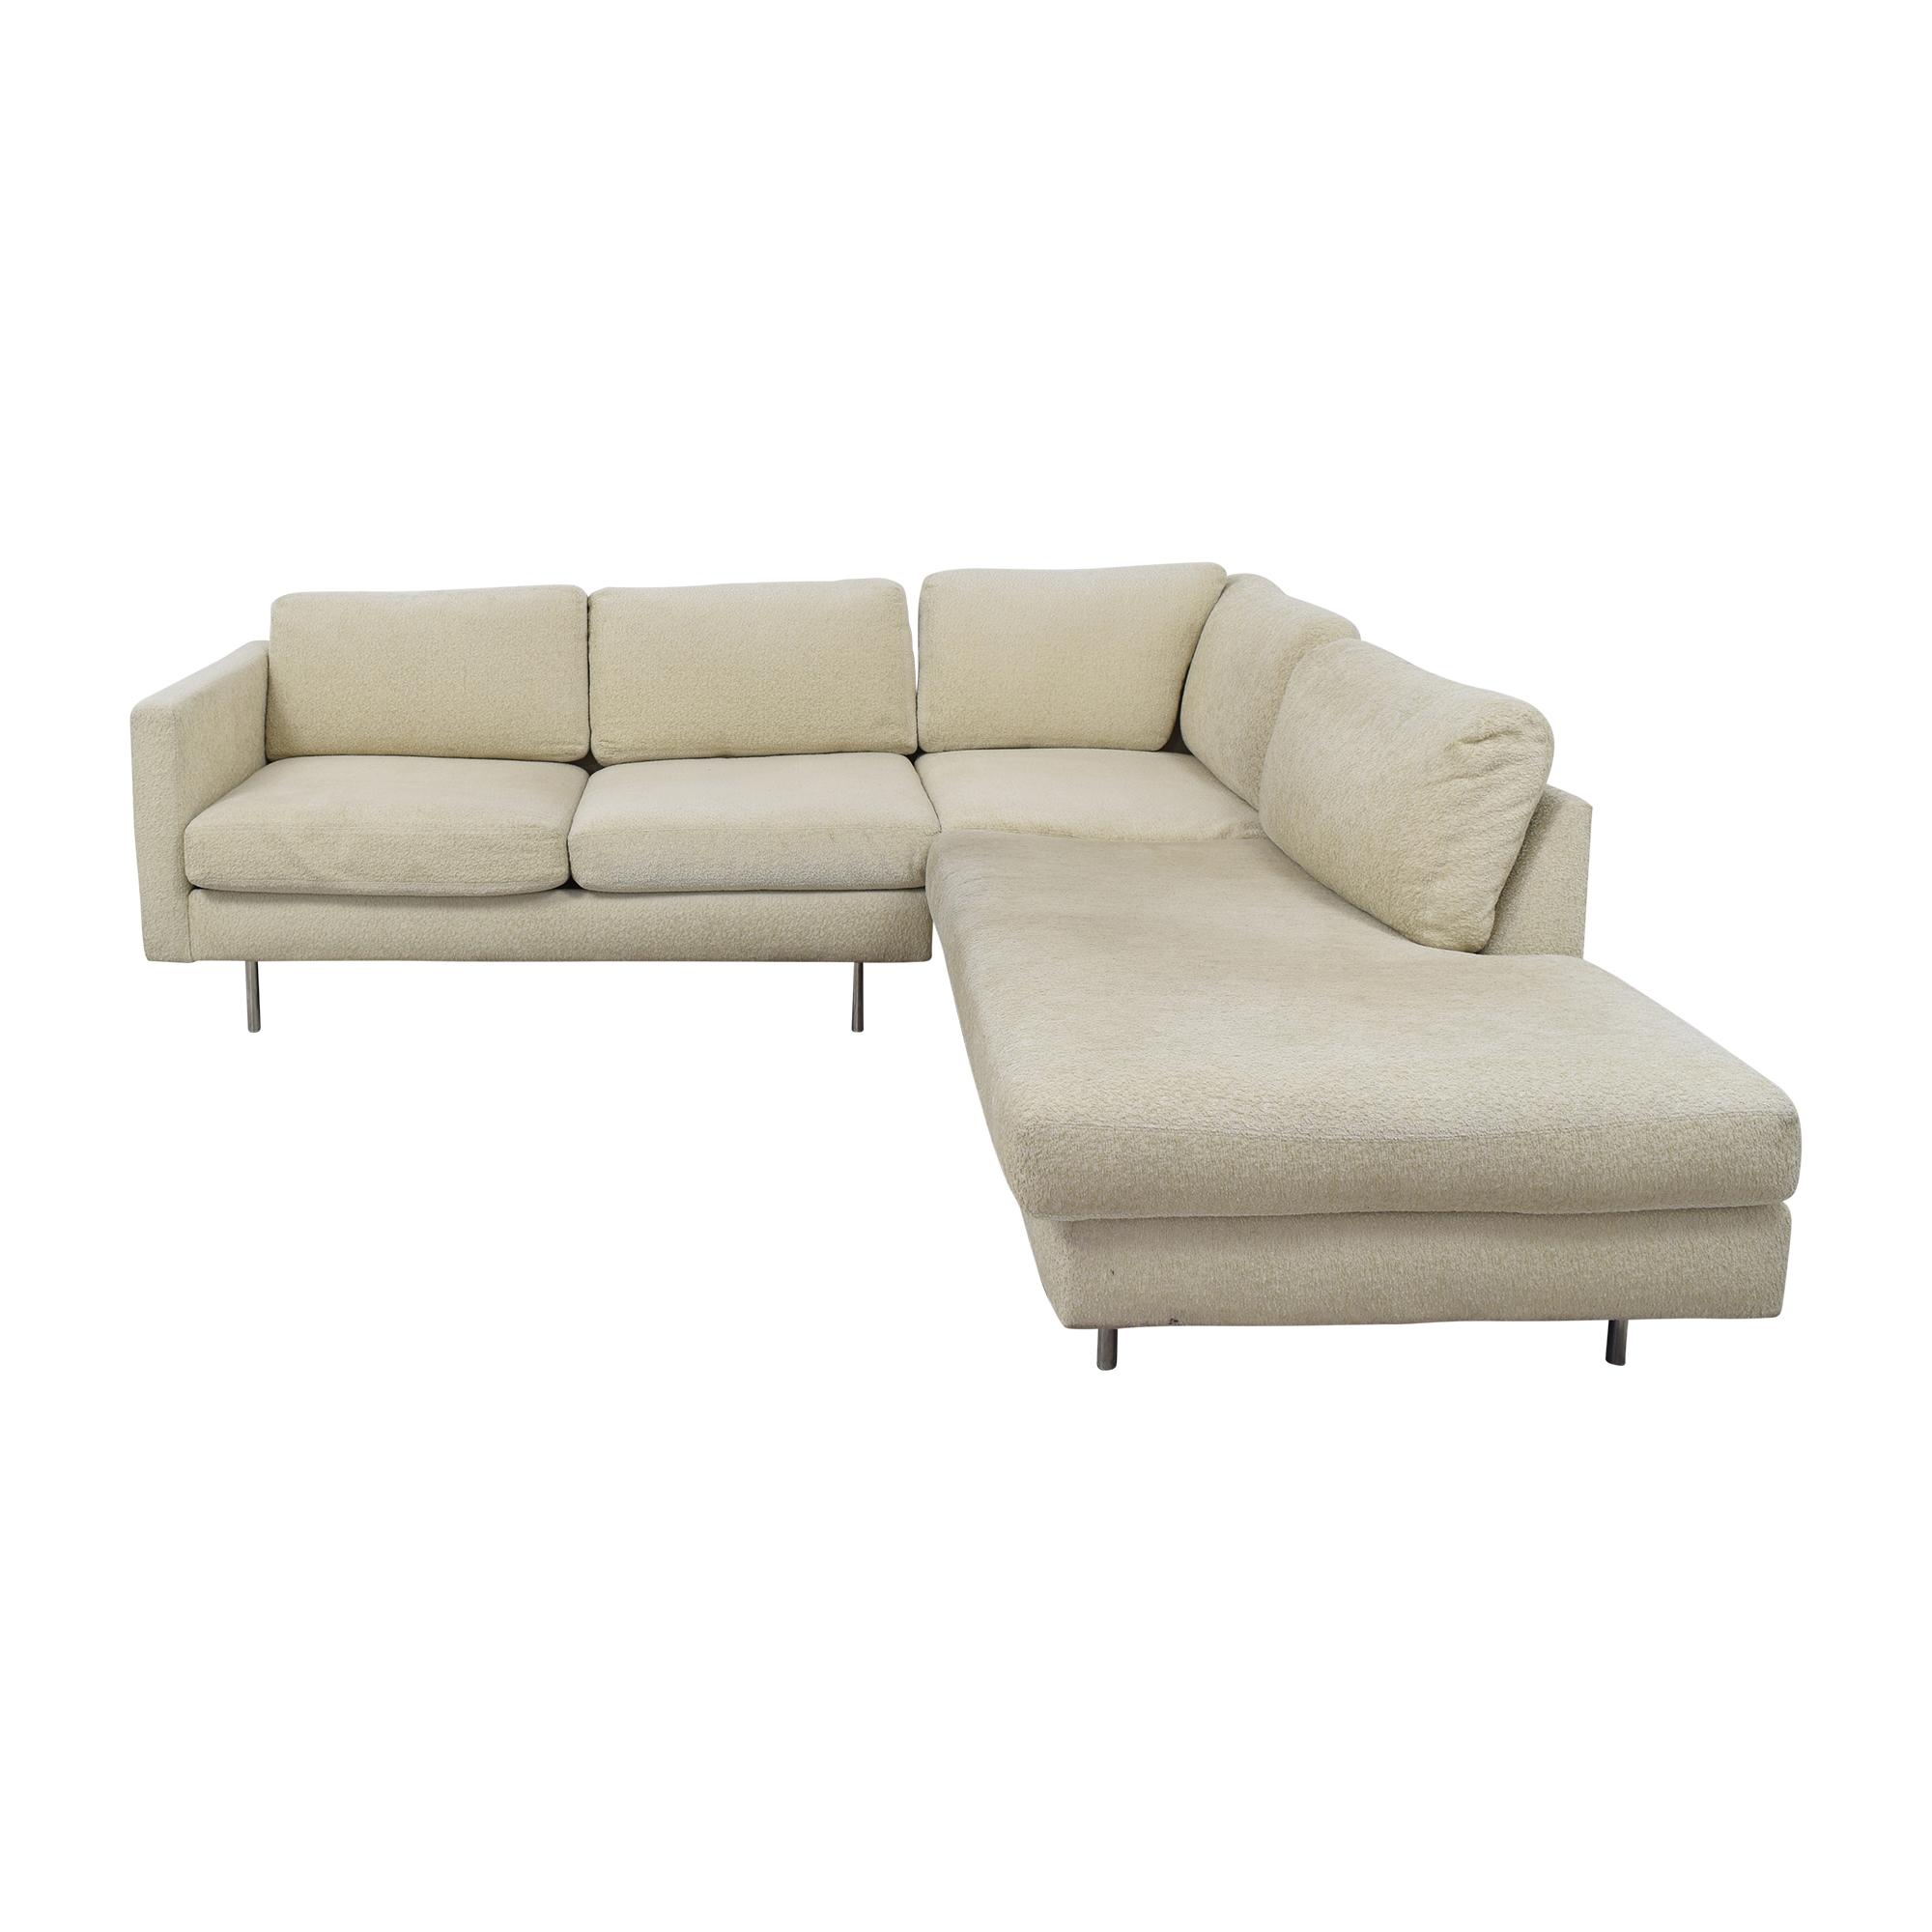 Thayer Coggin Thayer Coggin Milo Baughman Design Classic Sectional Sofa Sectionals